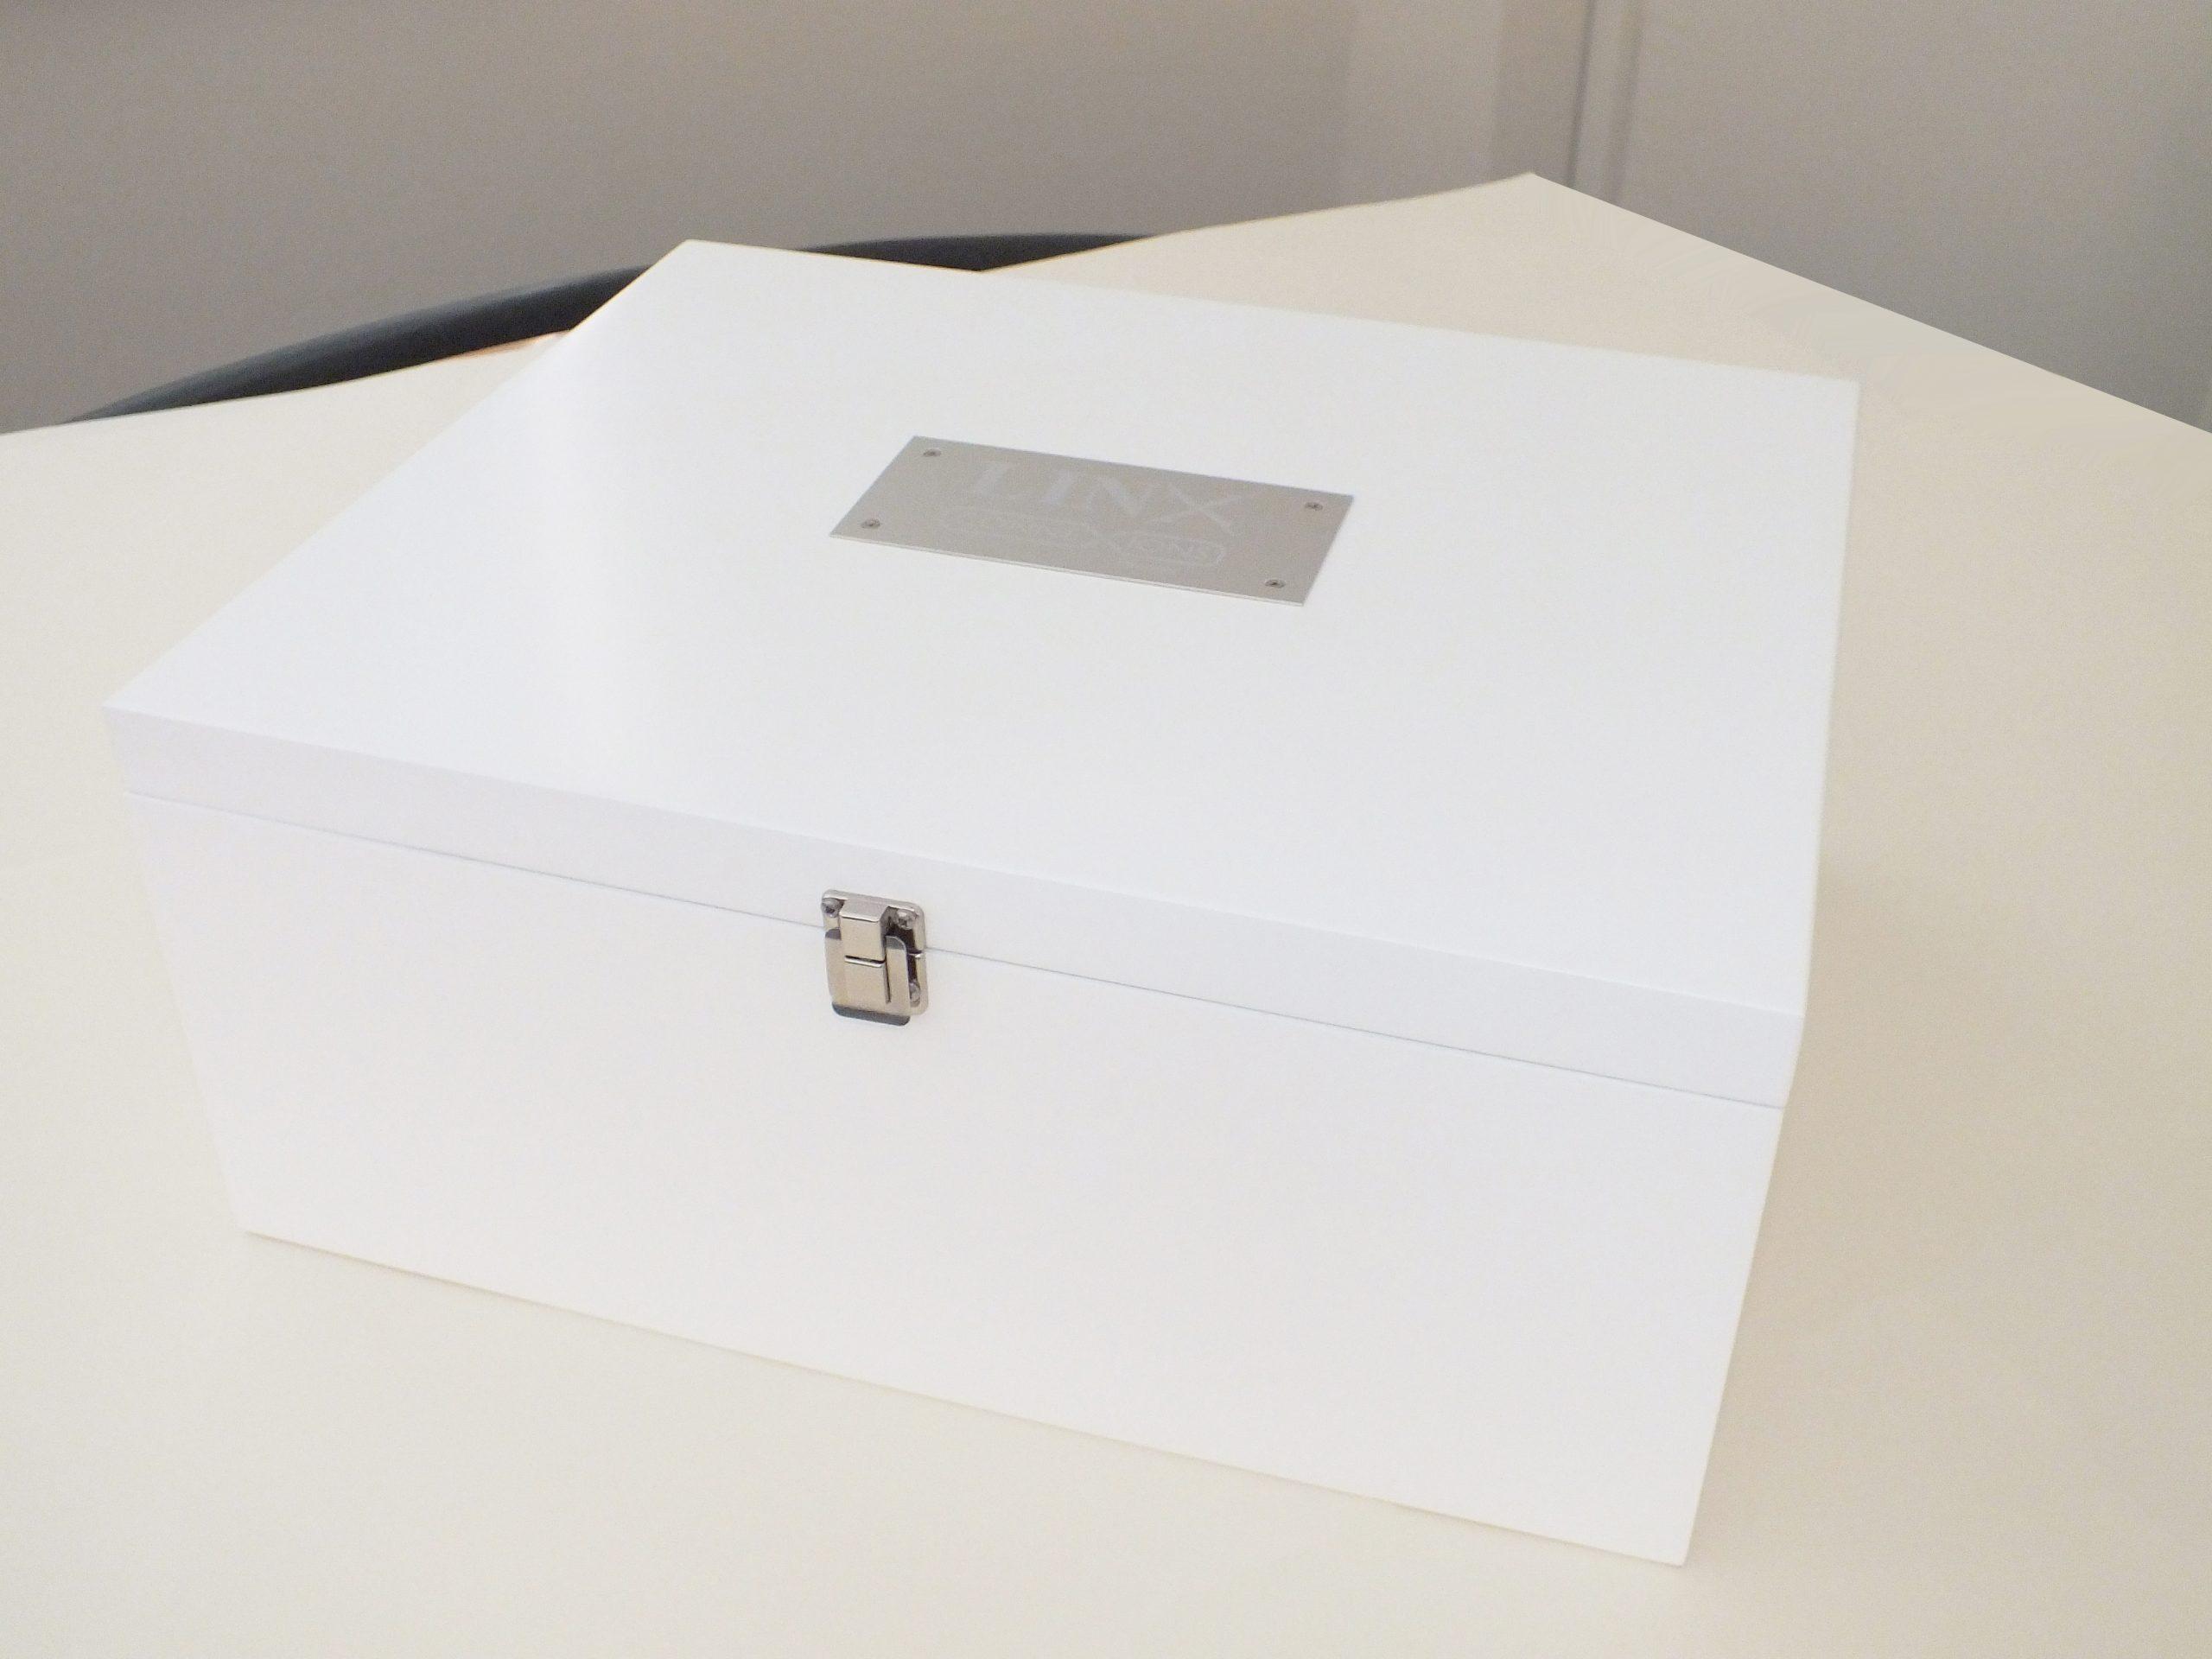 Presentation Box Laser etched plaque